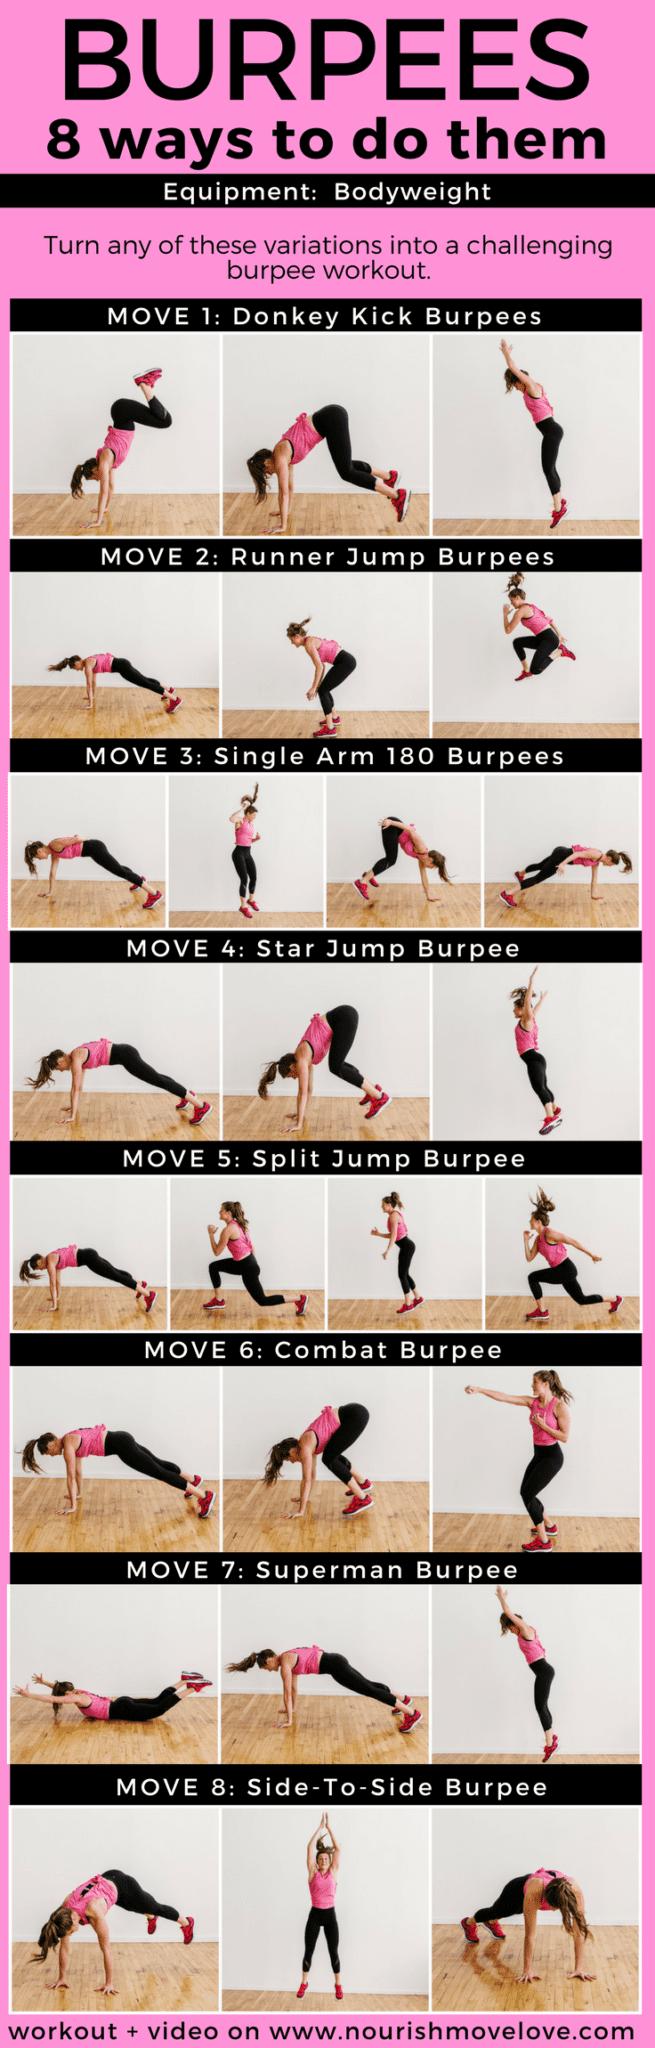 8 Butt-Kicking Burpees Workout   www.nourishmovelove.com